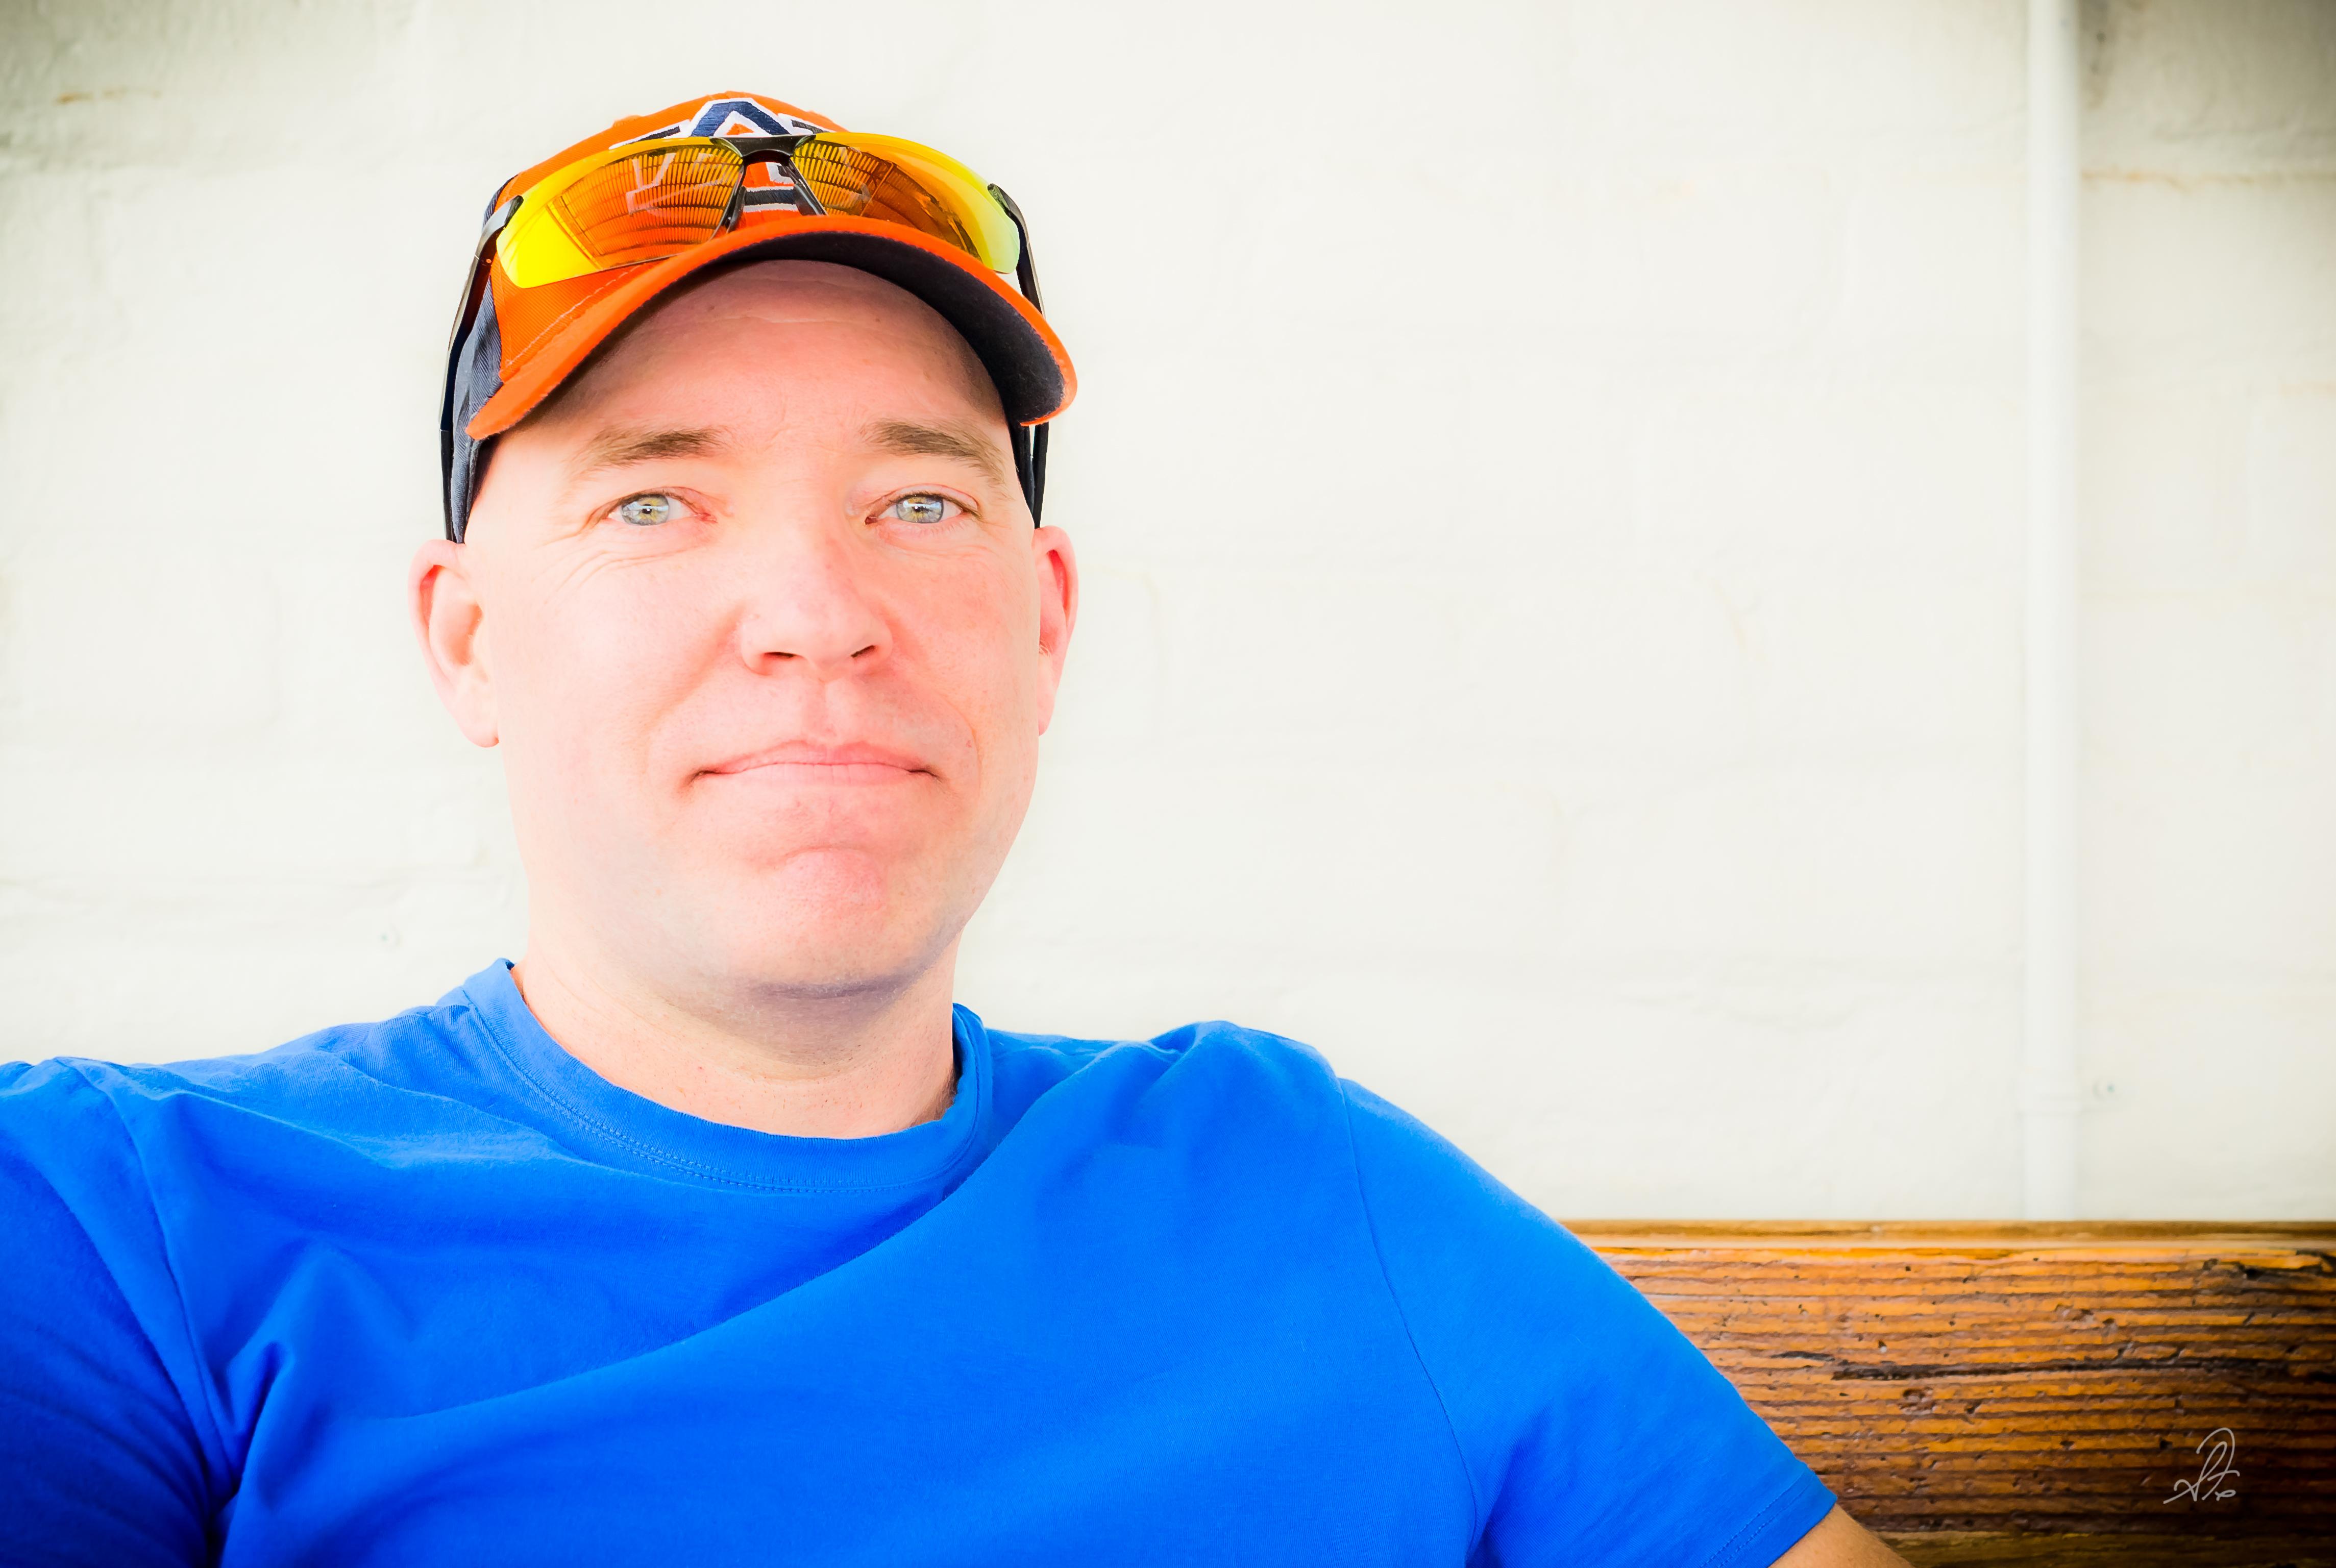 Scott Fillmer Self Portrait, 2014